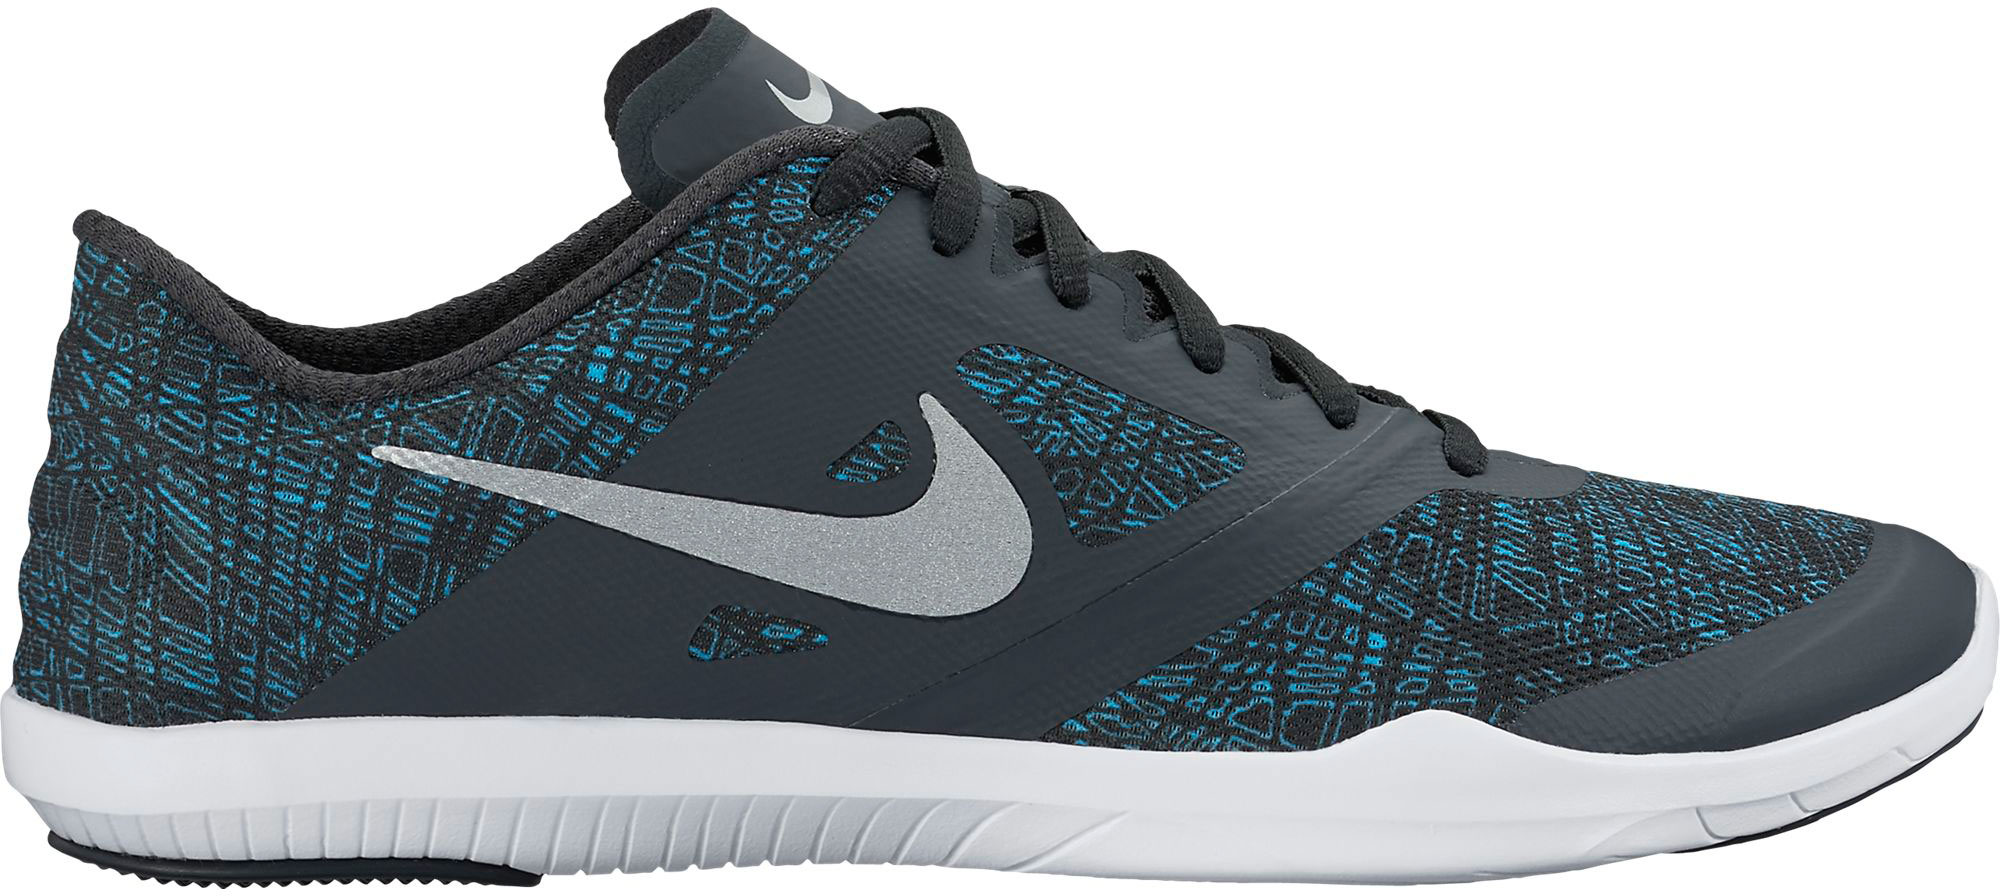 5f994947c4 Nike STUDIO TRAINER 2 PRINT W